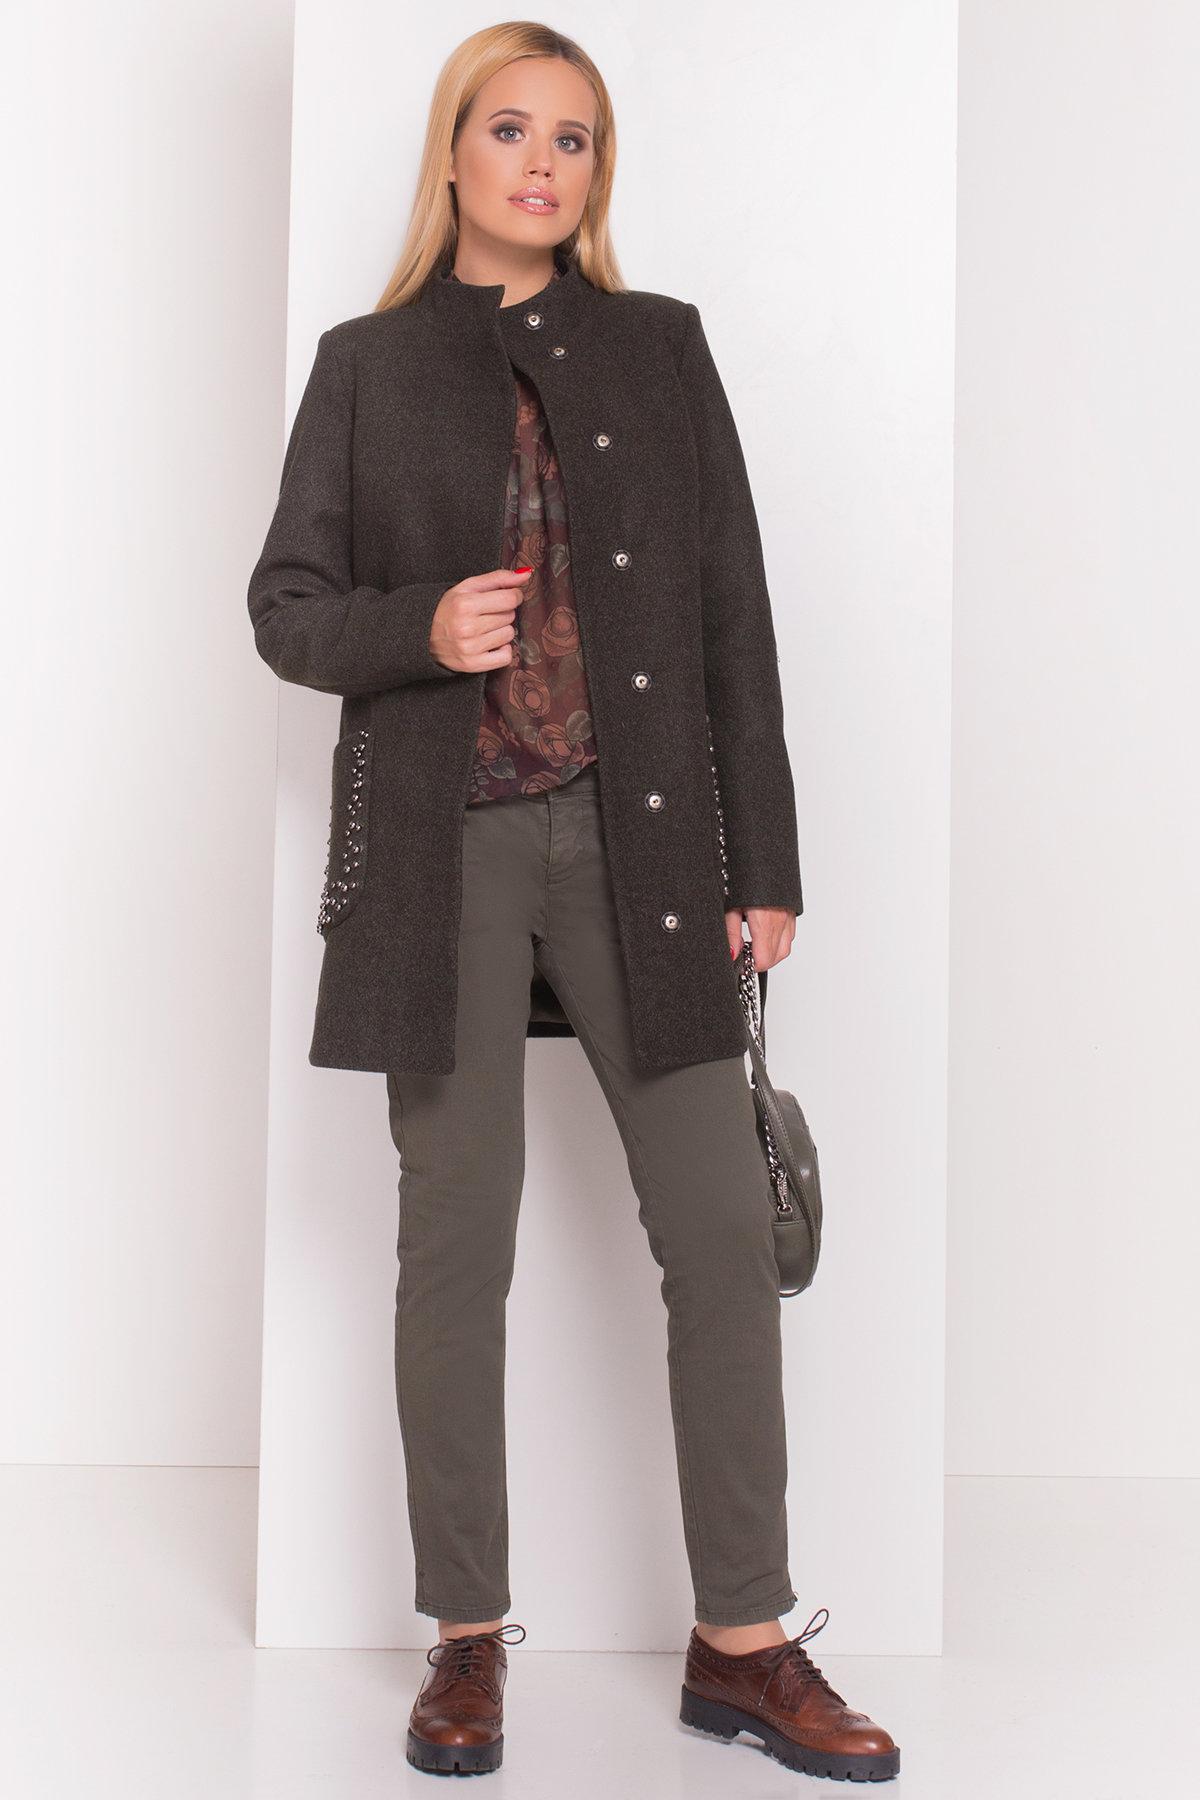 Пальто Даймон 5377 АРТ. 36746 Цвет: Хаки - фото 1, интернет магазин tm-modus.ru